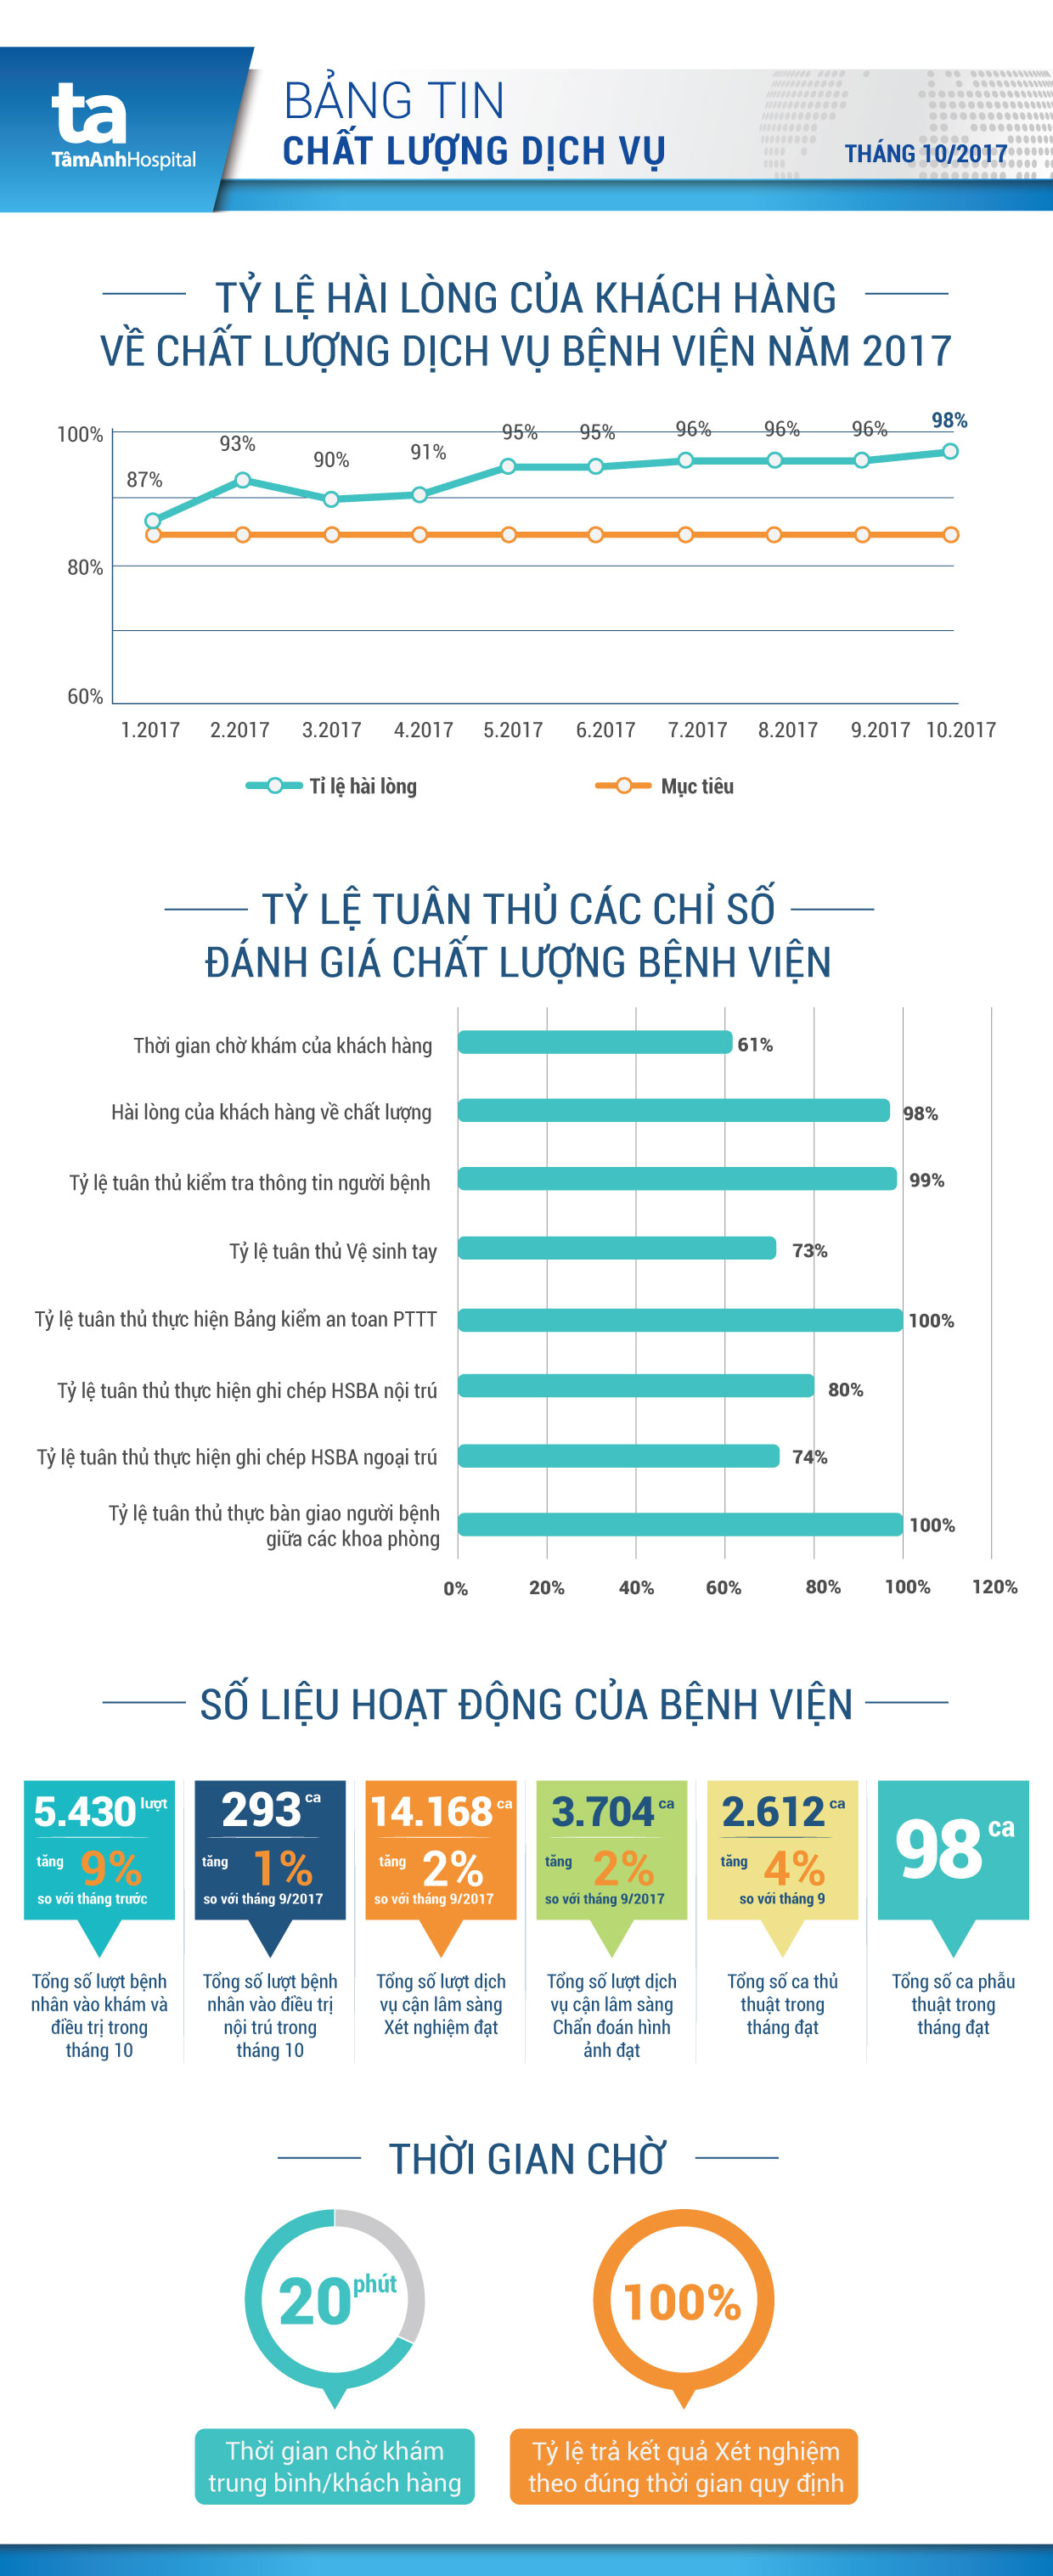 BVTA_BANTINCHATLUONG_Thang10